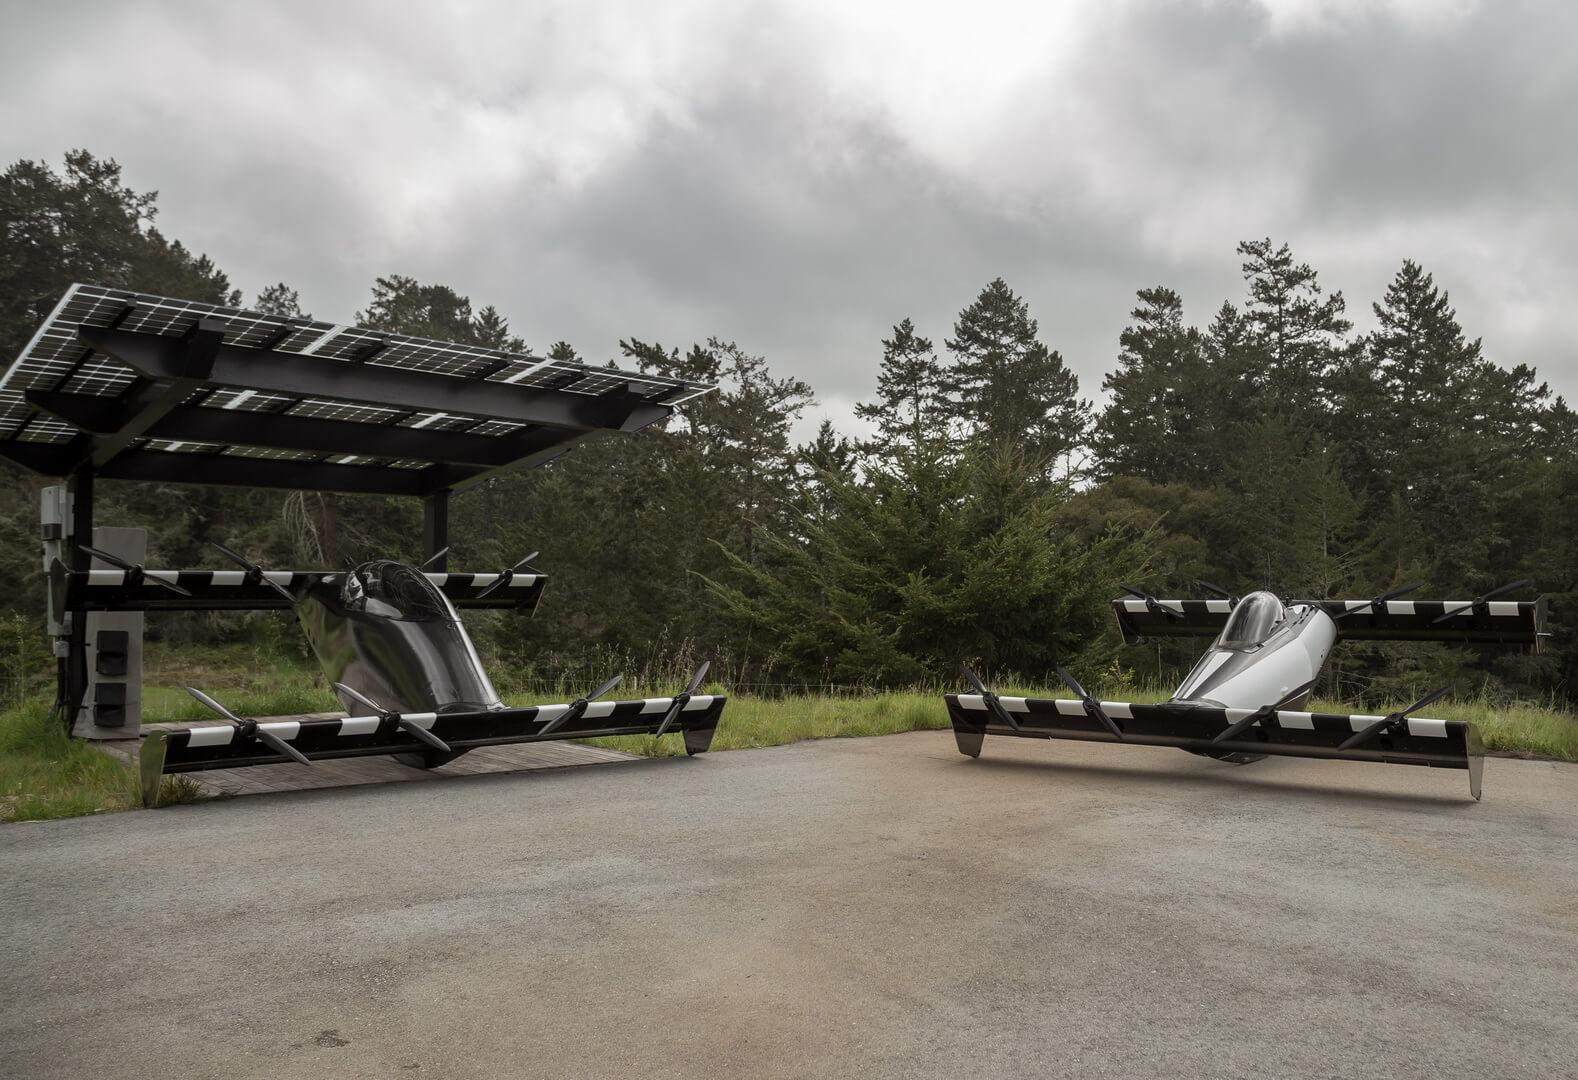 Электрические прототипы самолета BlackFly